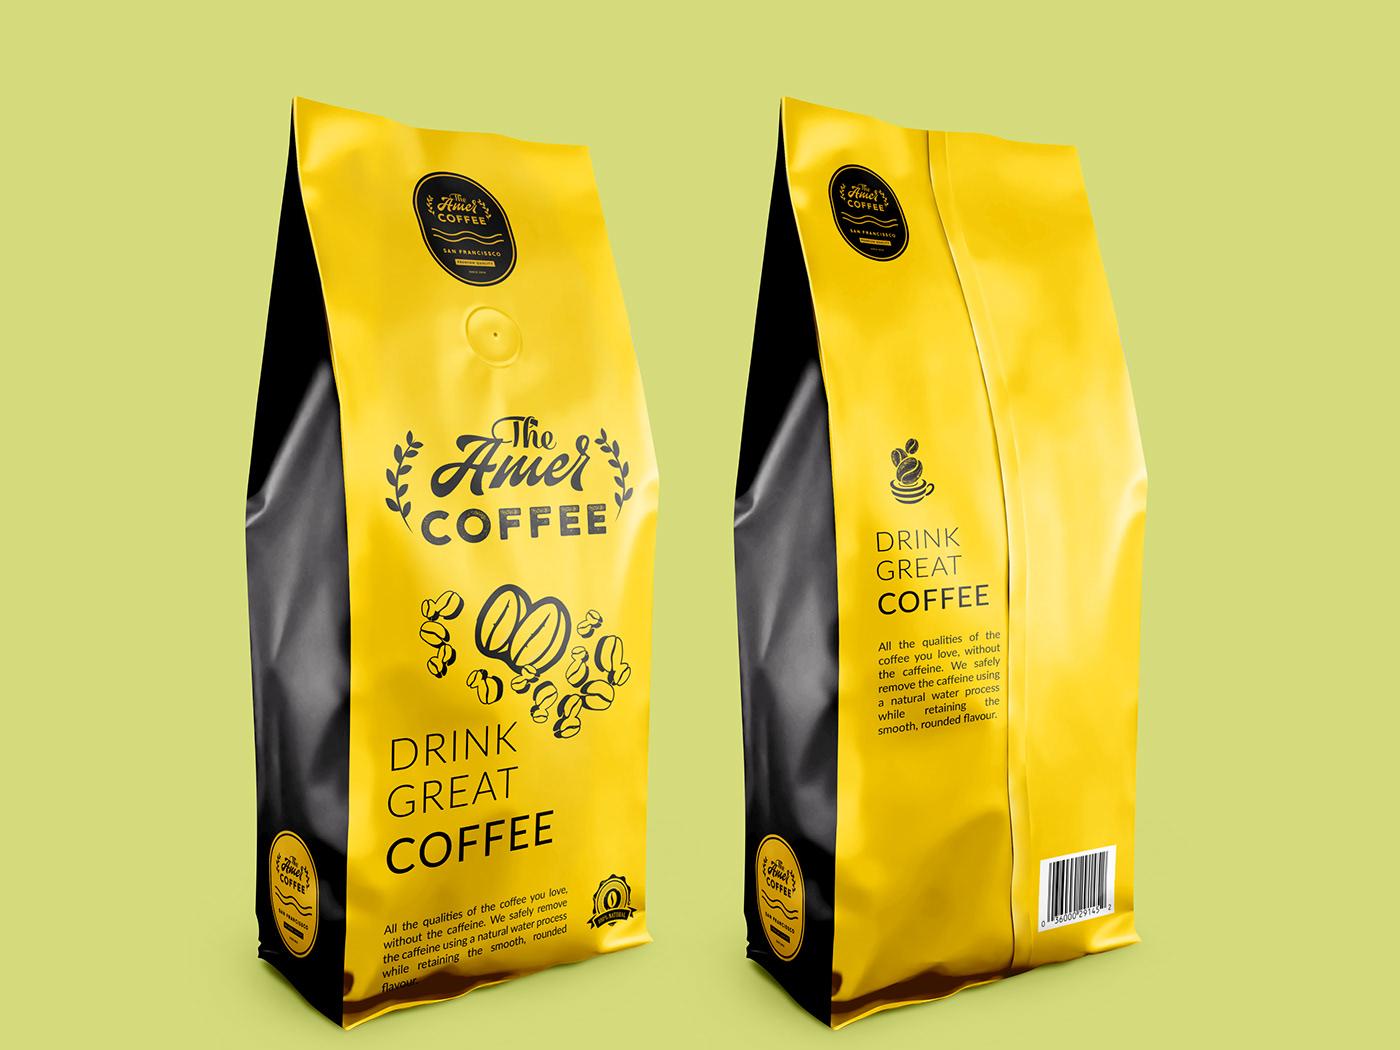 The Amer Coffee Packaging Design By Inderjit Singh On Dribbble